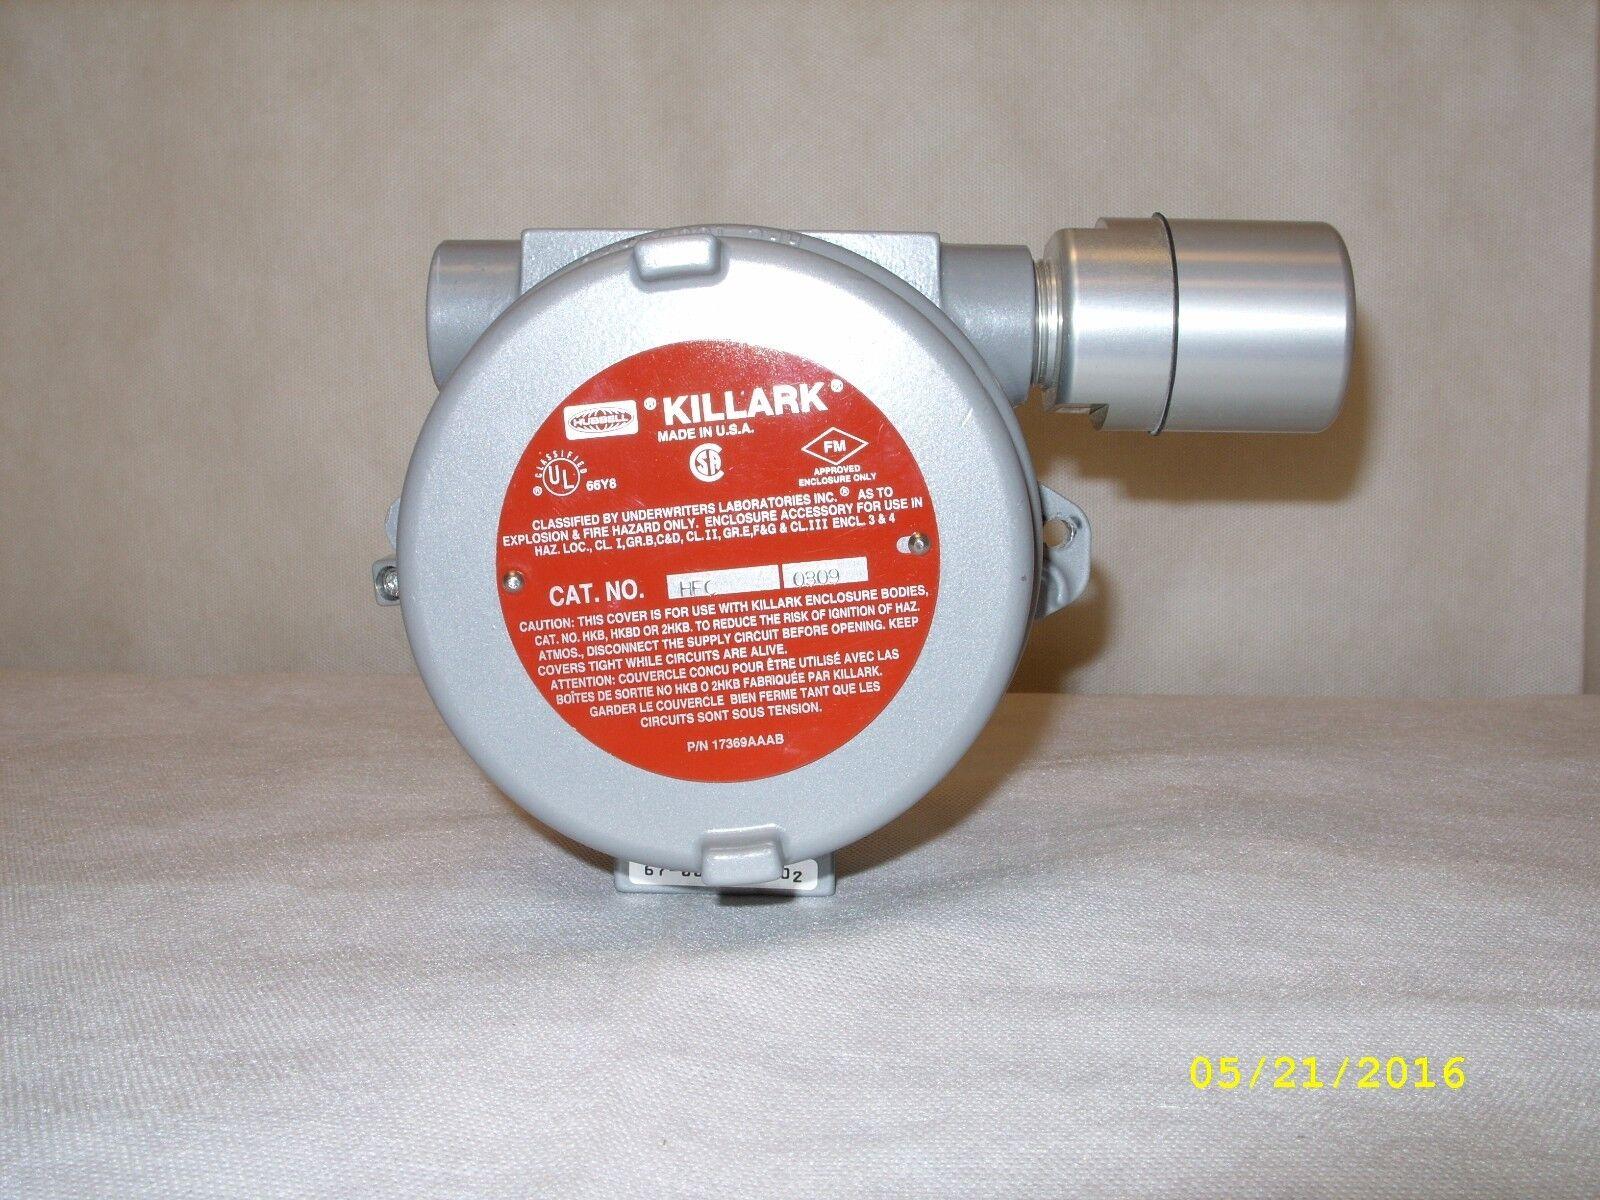 EXTRA Killark Gastech Explosion Proof Receptacle Box  SPM25122